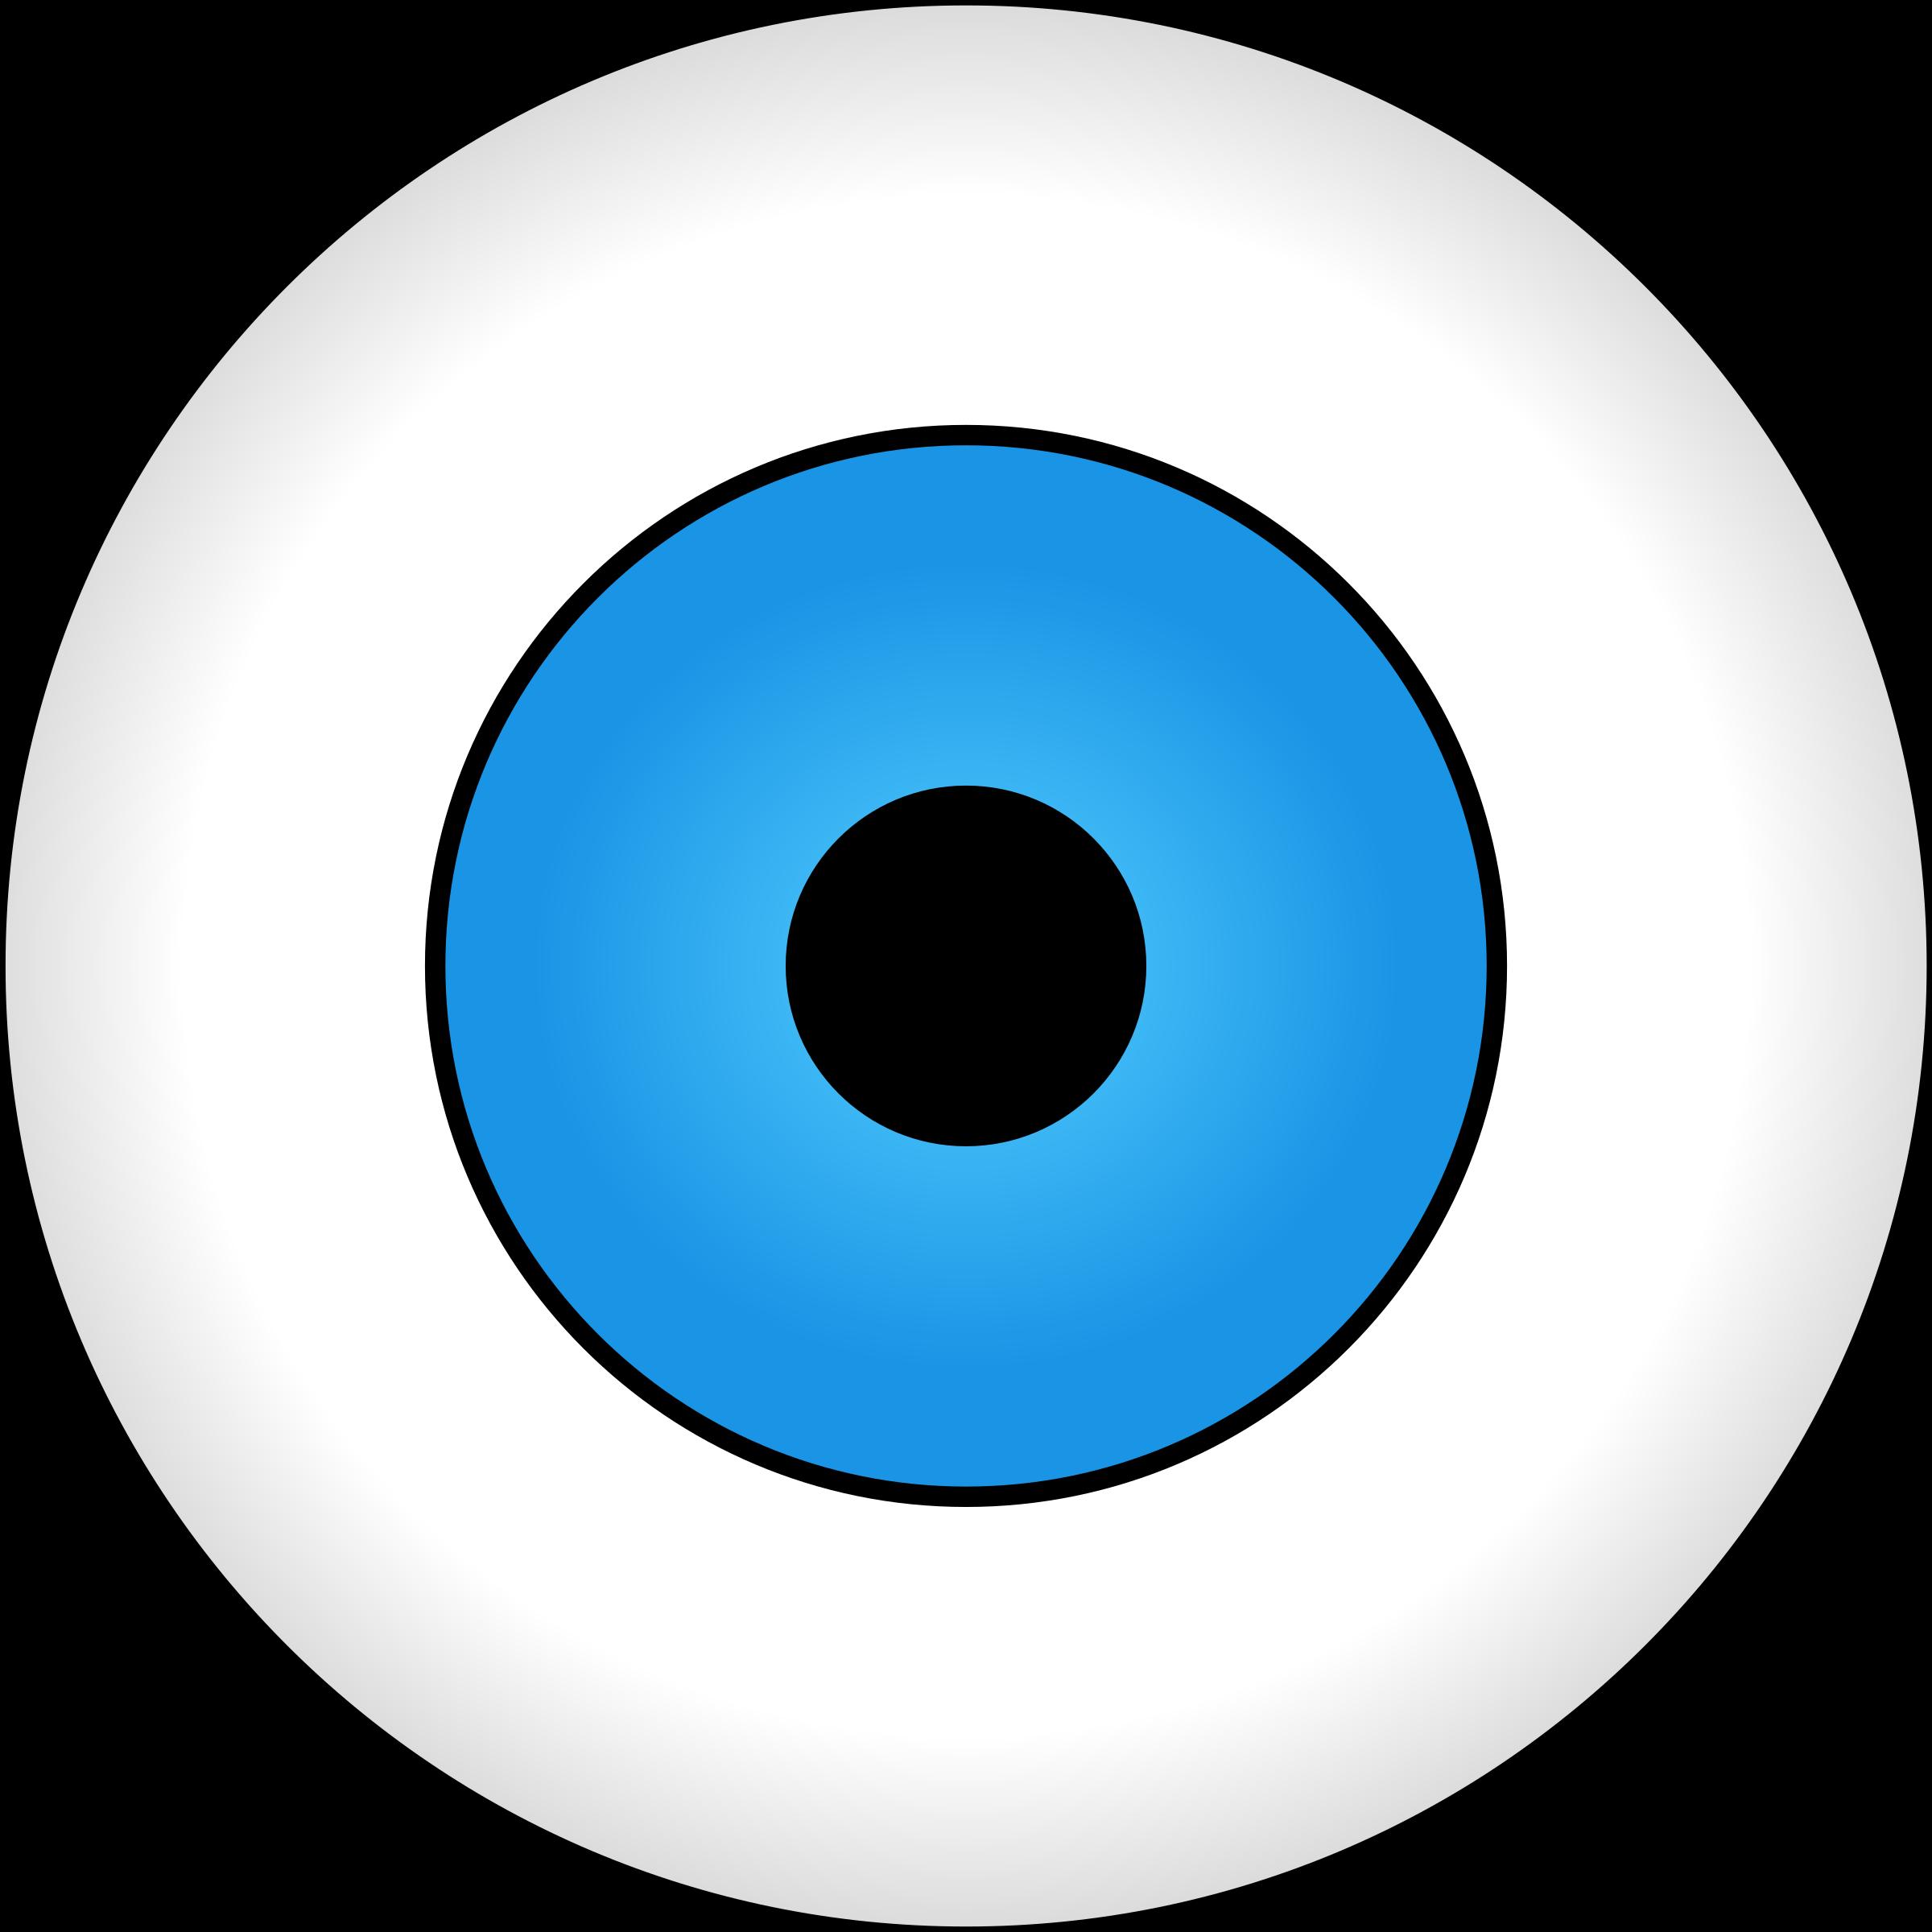 Eye clipart blue. Olho azul big image